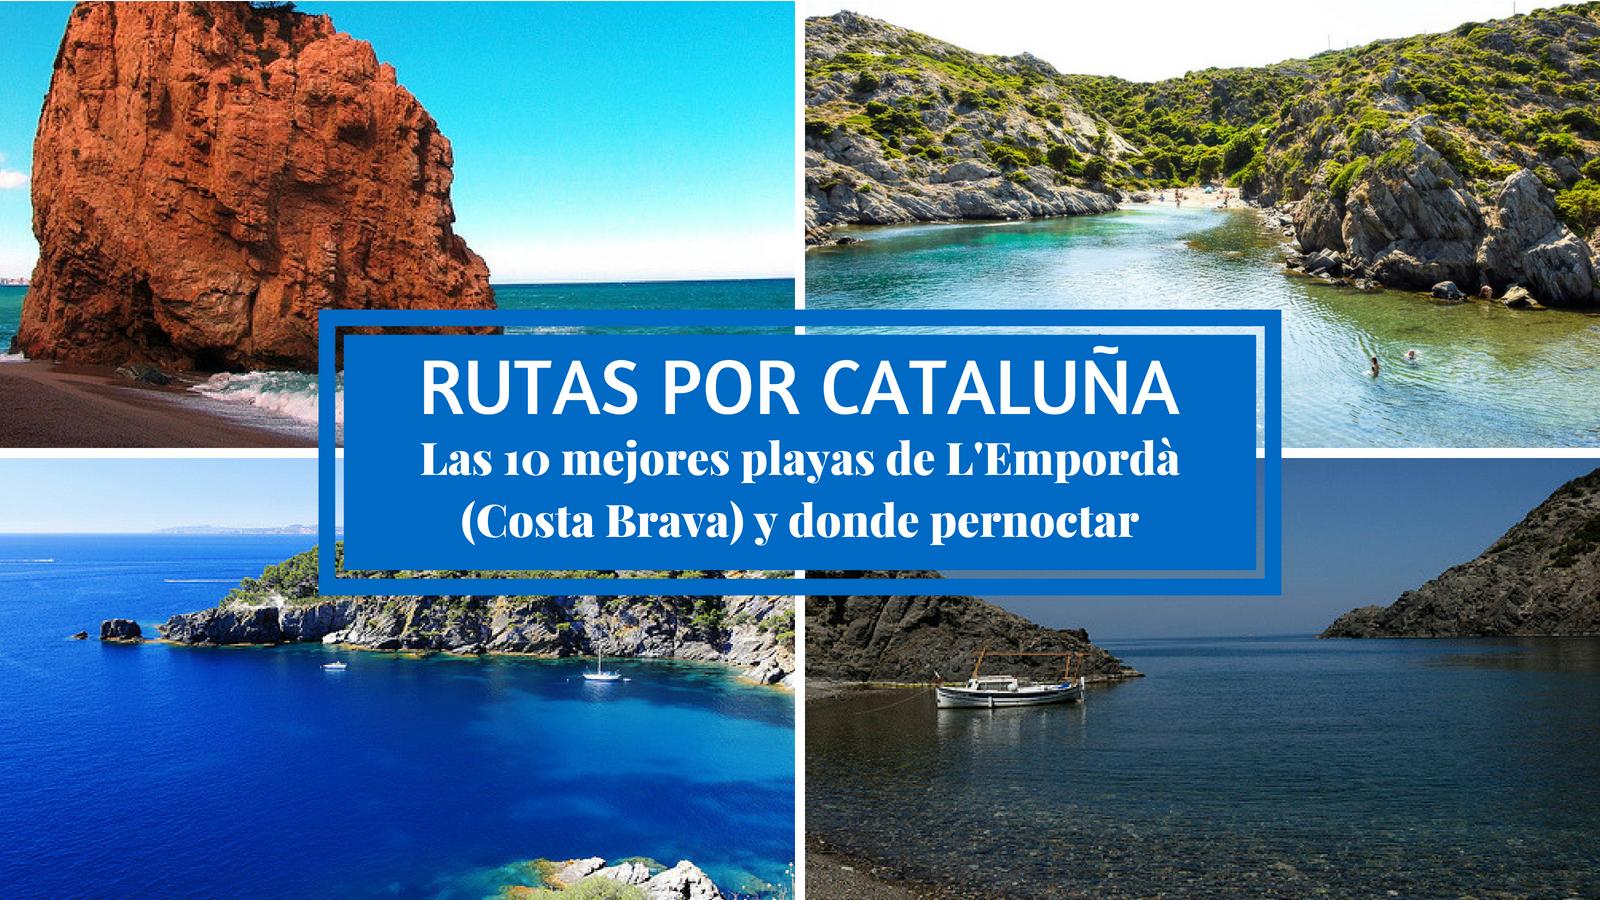 Las 10 mejores playas de L'Empordà (Costa Brava)